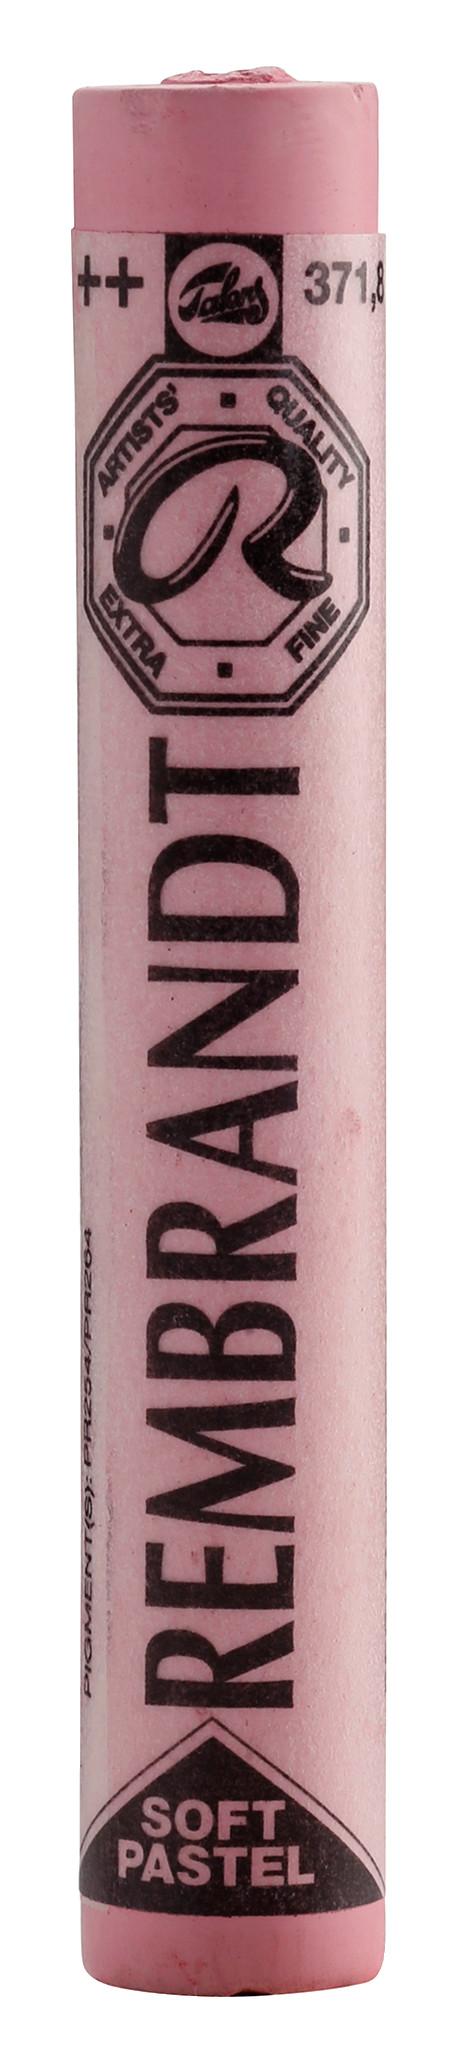 Rembrandt Soft Pastel Round Full Stick Permanent Red Deep(8) (371.8)